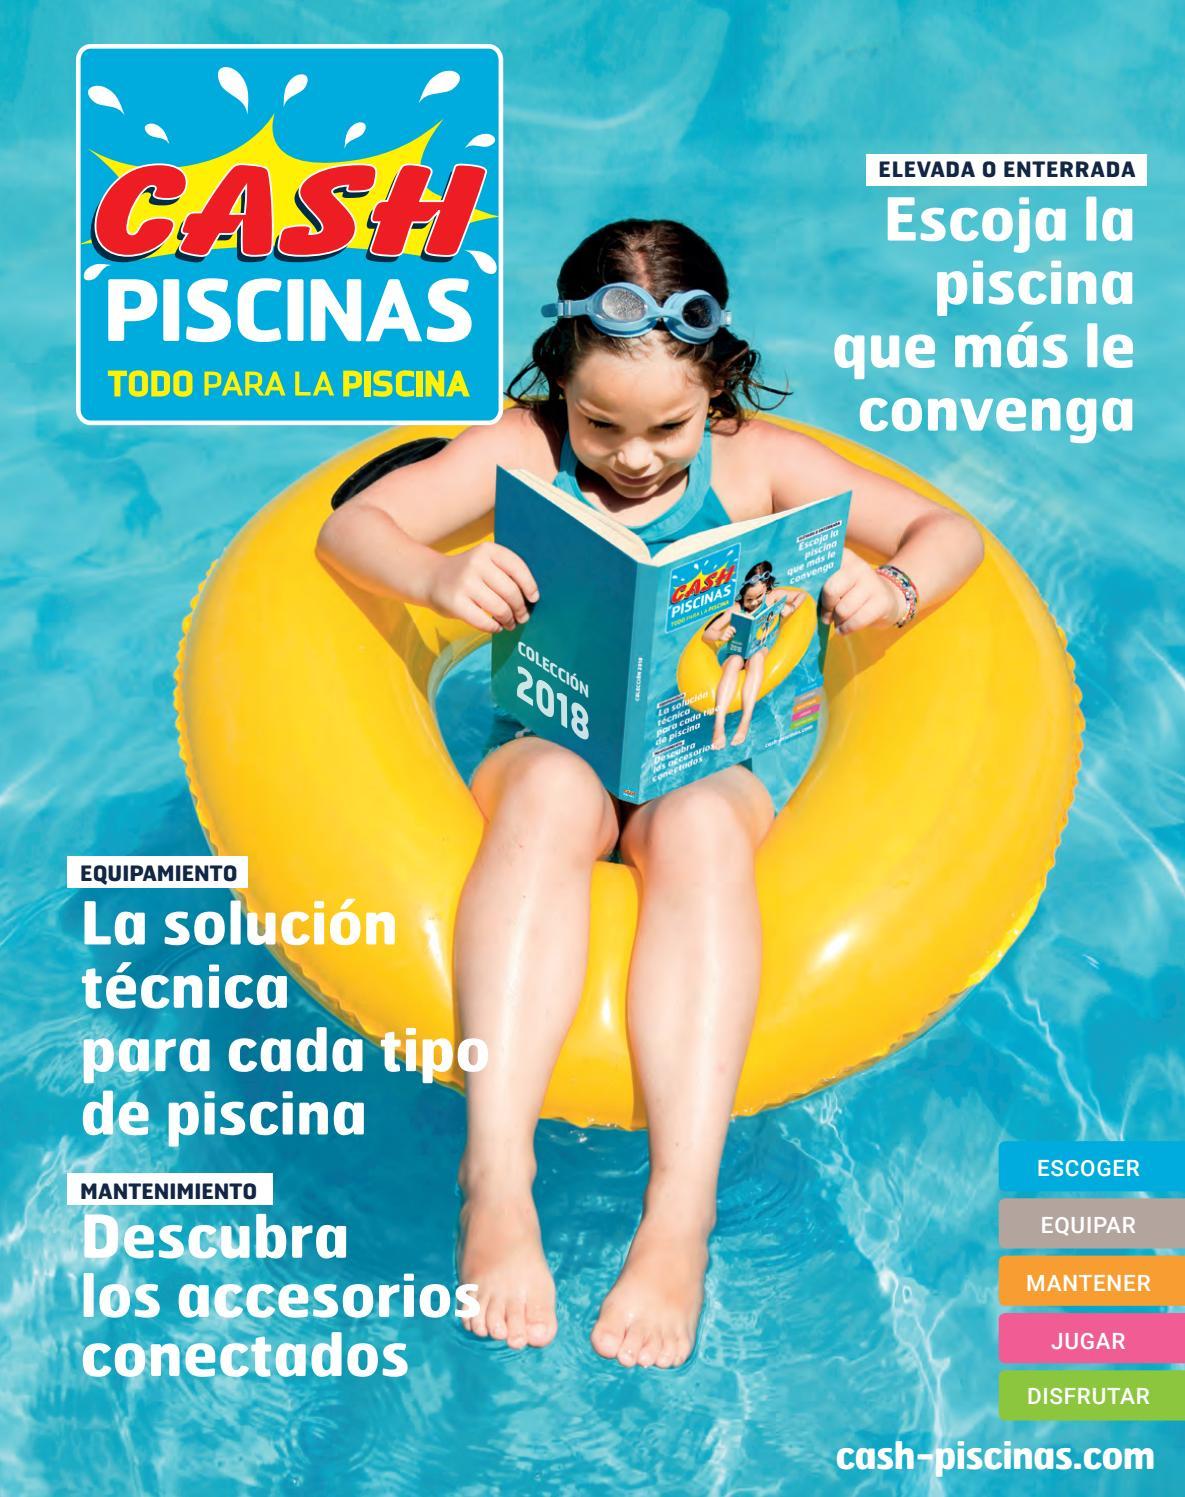 Cash Piscinas - Catálogo 2018 by Octave Octave - issuu